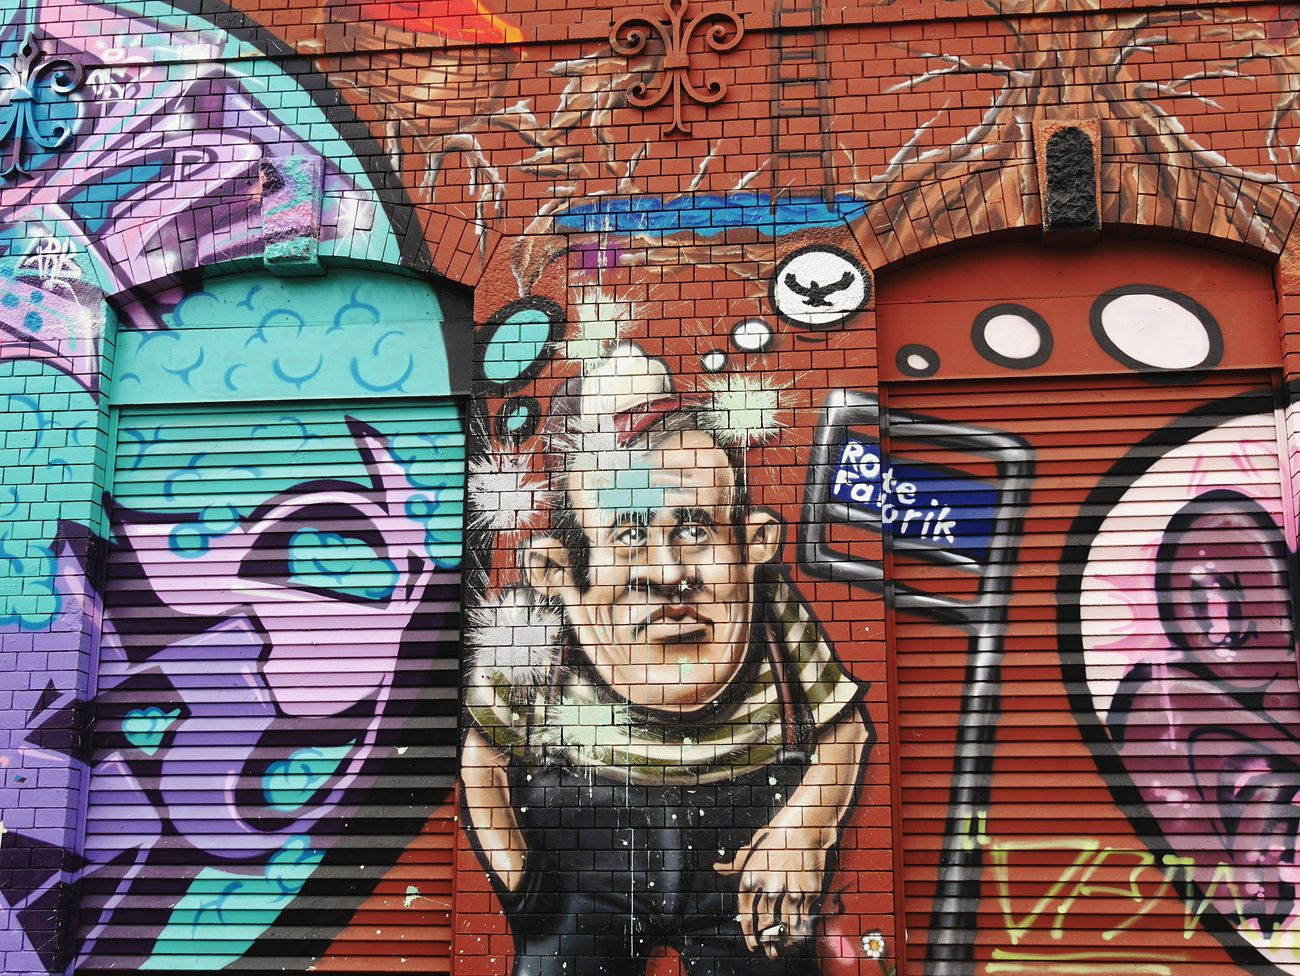 Urban Landscape Streetphotography EyeEm Best Shots Graffiti Rote Fabrik Urban UrbanART